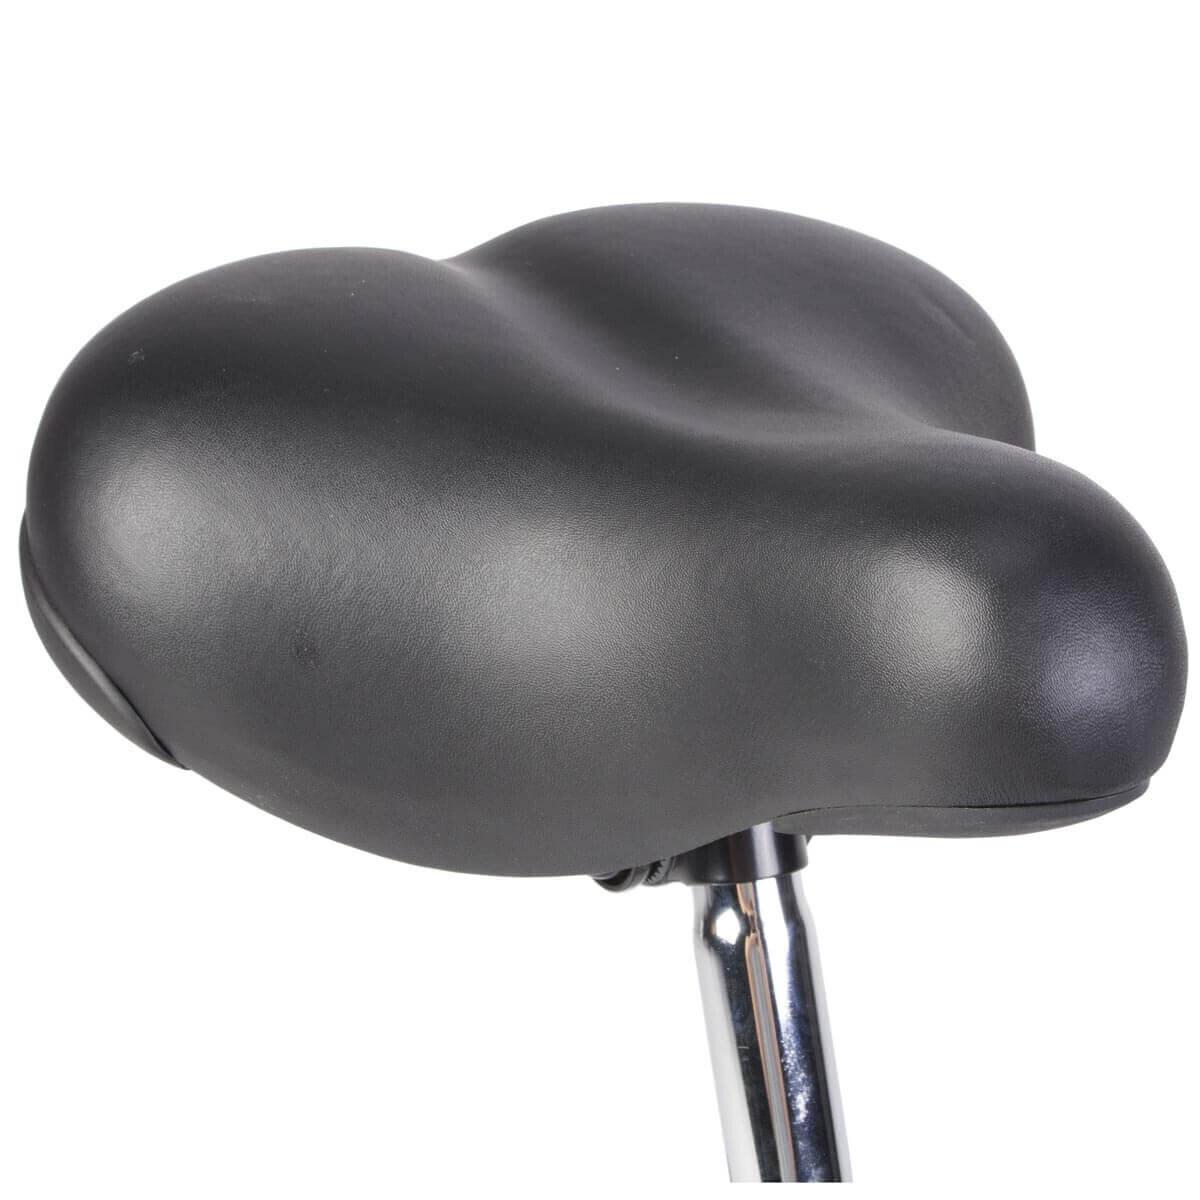 Rubi SR1 Rolling Knee Pad Seat